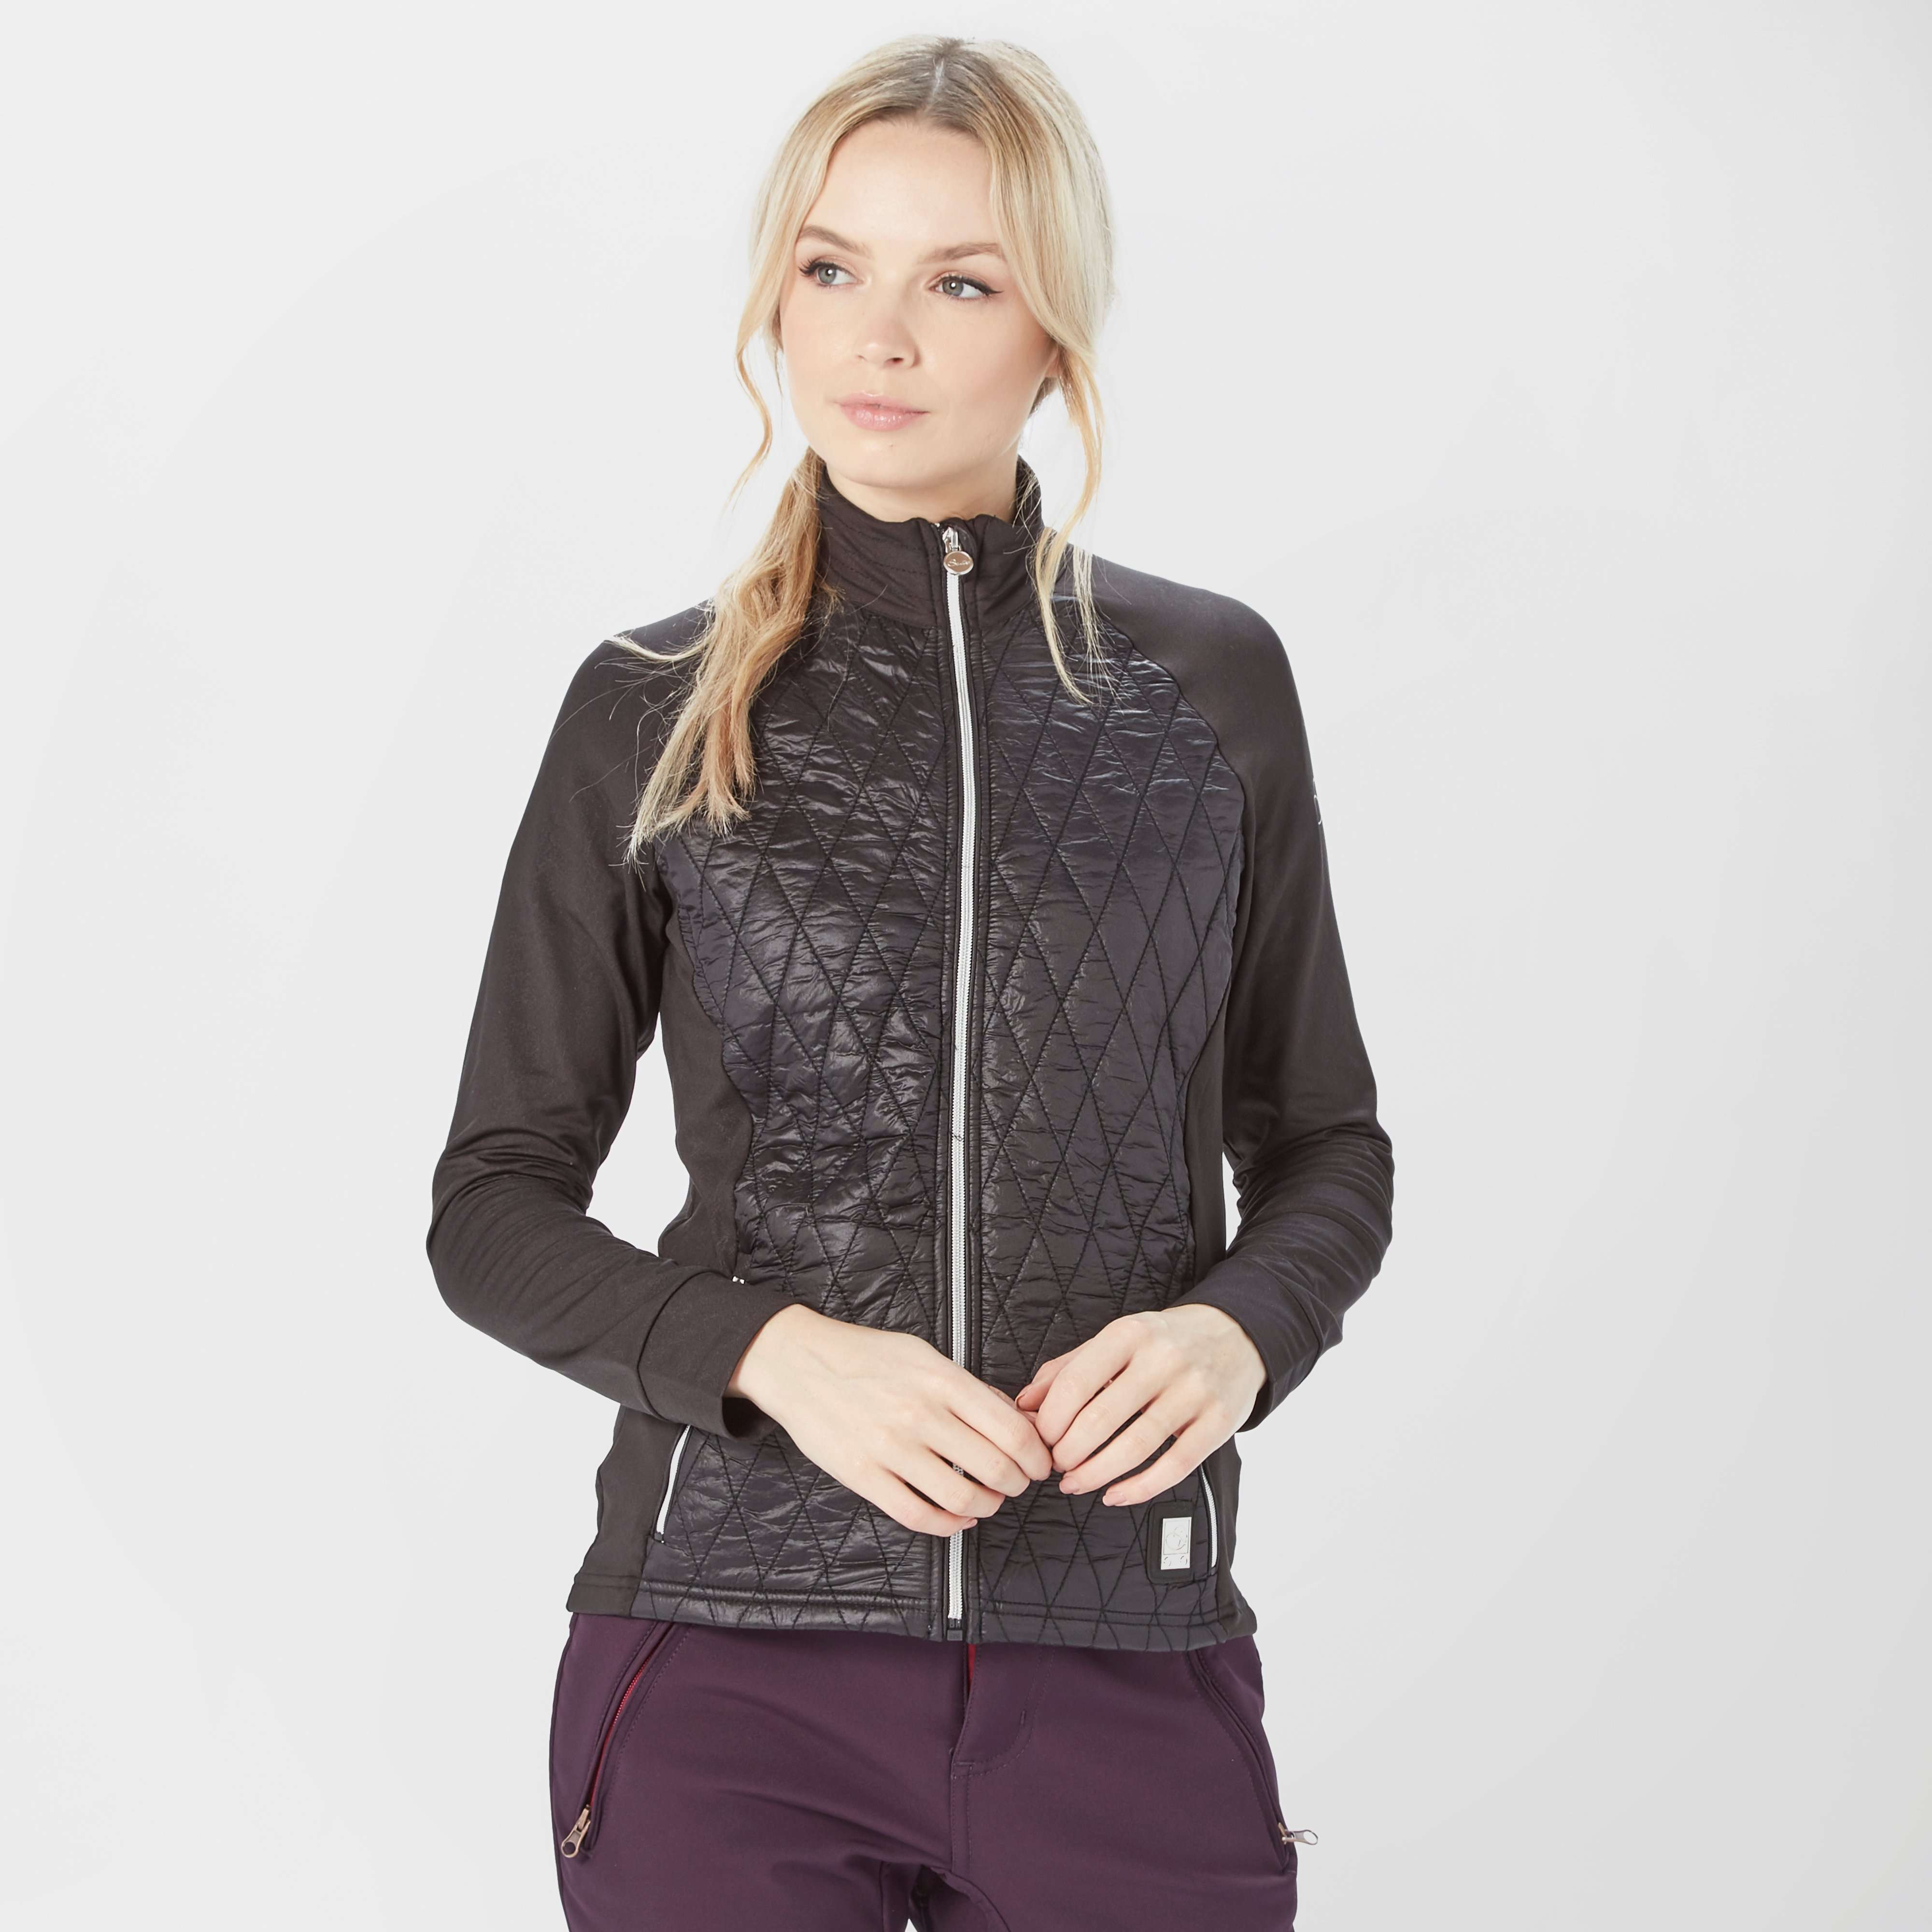 DARE 2B Women's Irised Core Stretch Jacket